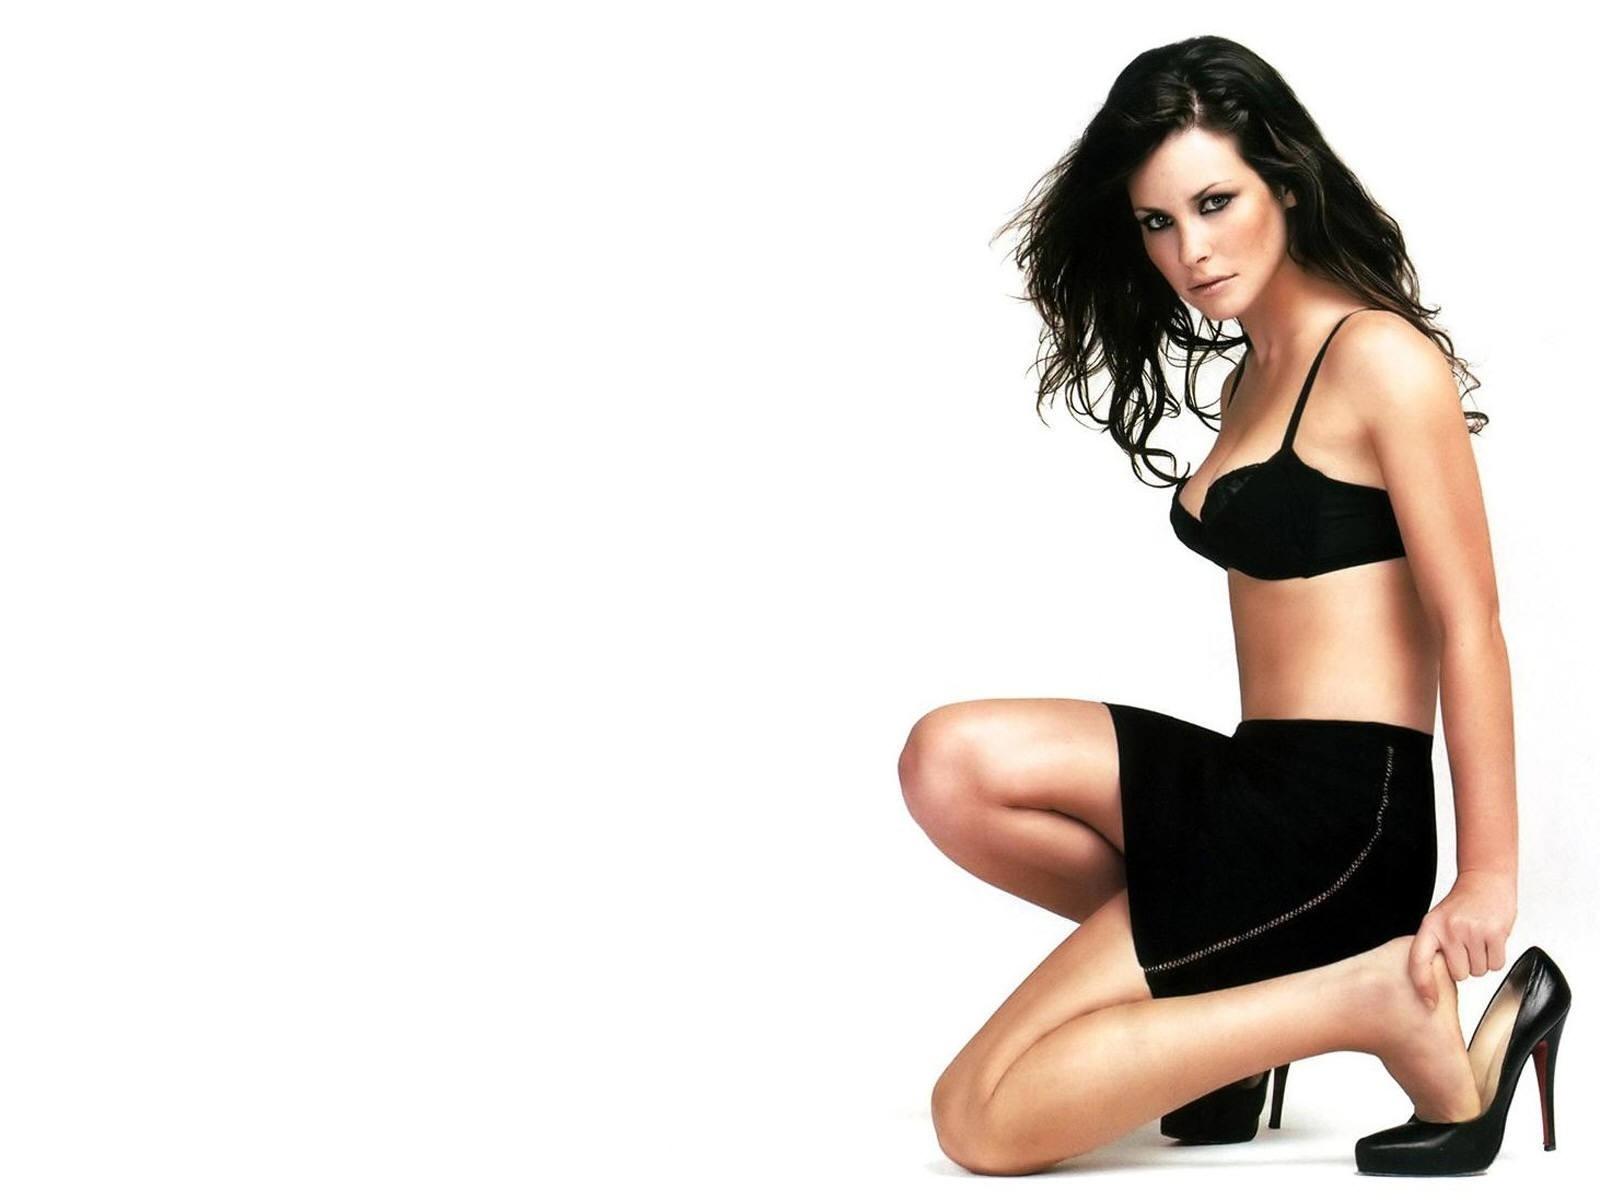 Wallpaper di una supersexy Evangeline Lilly